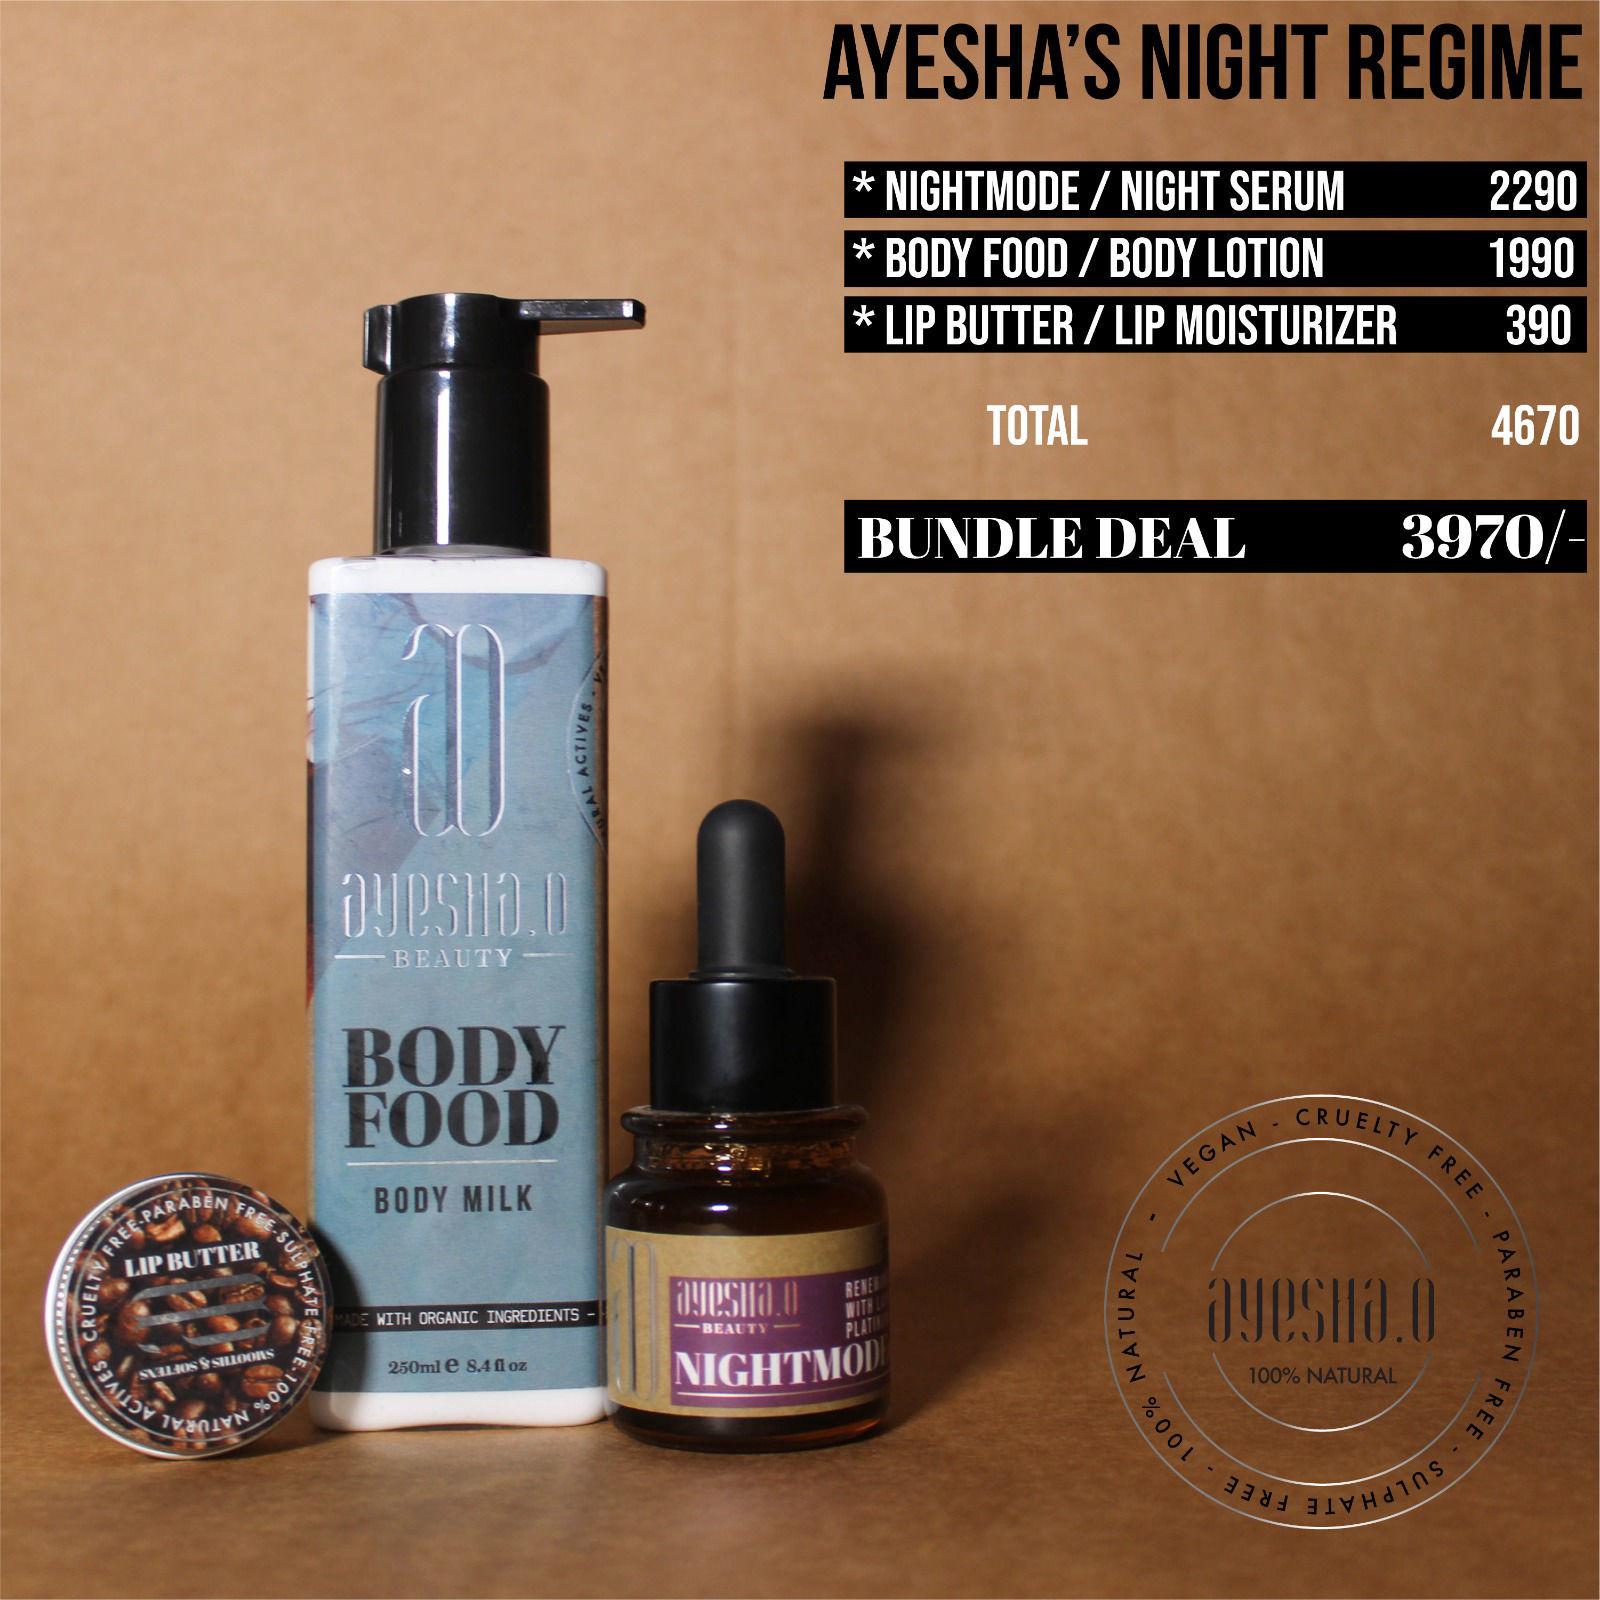 Ayesha's Night Regime